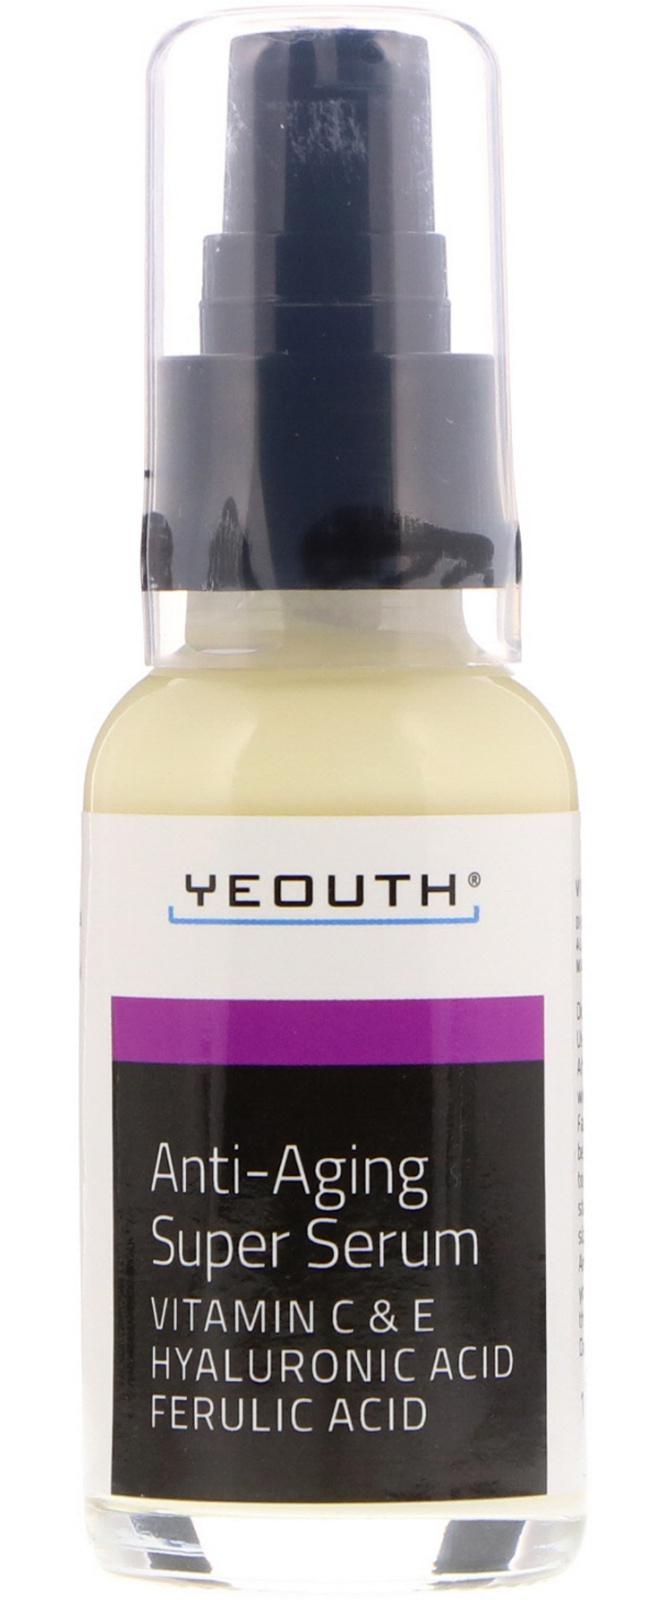 Yeouth Anti-Aging Super Serum